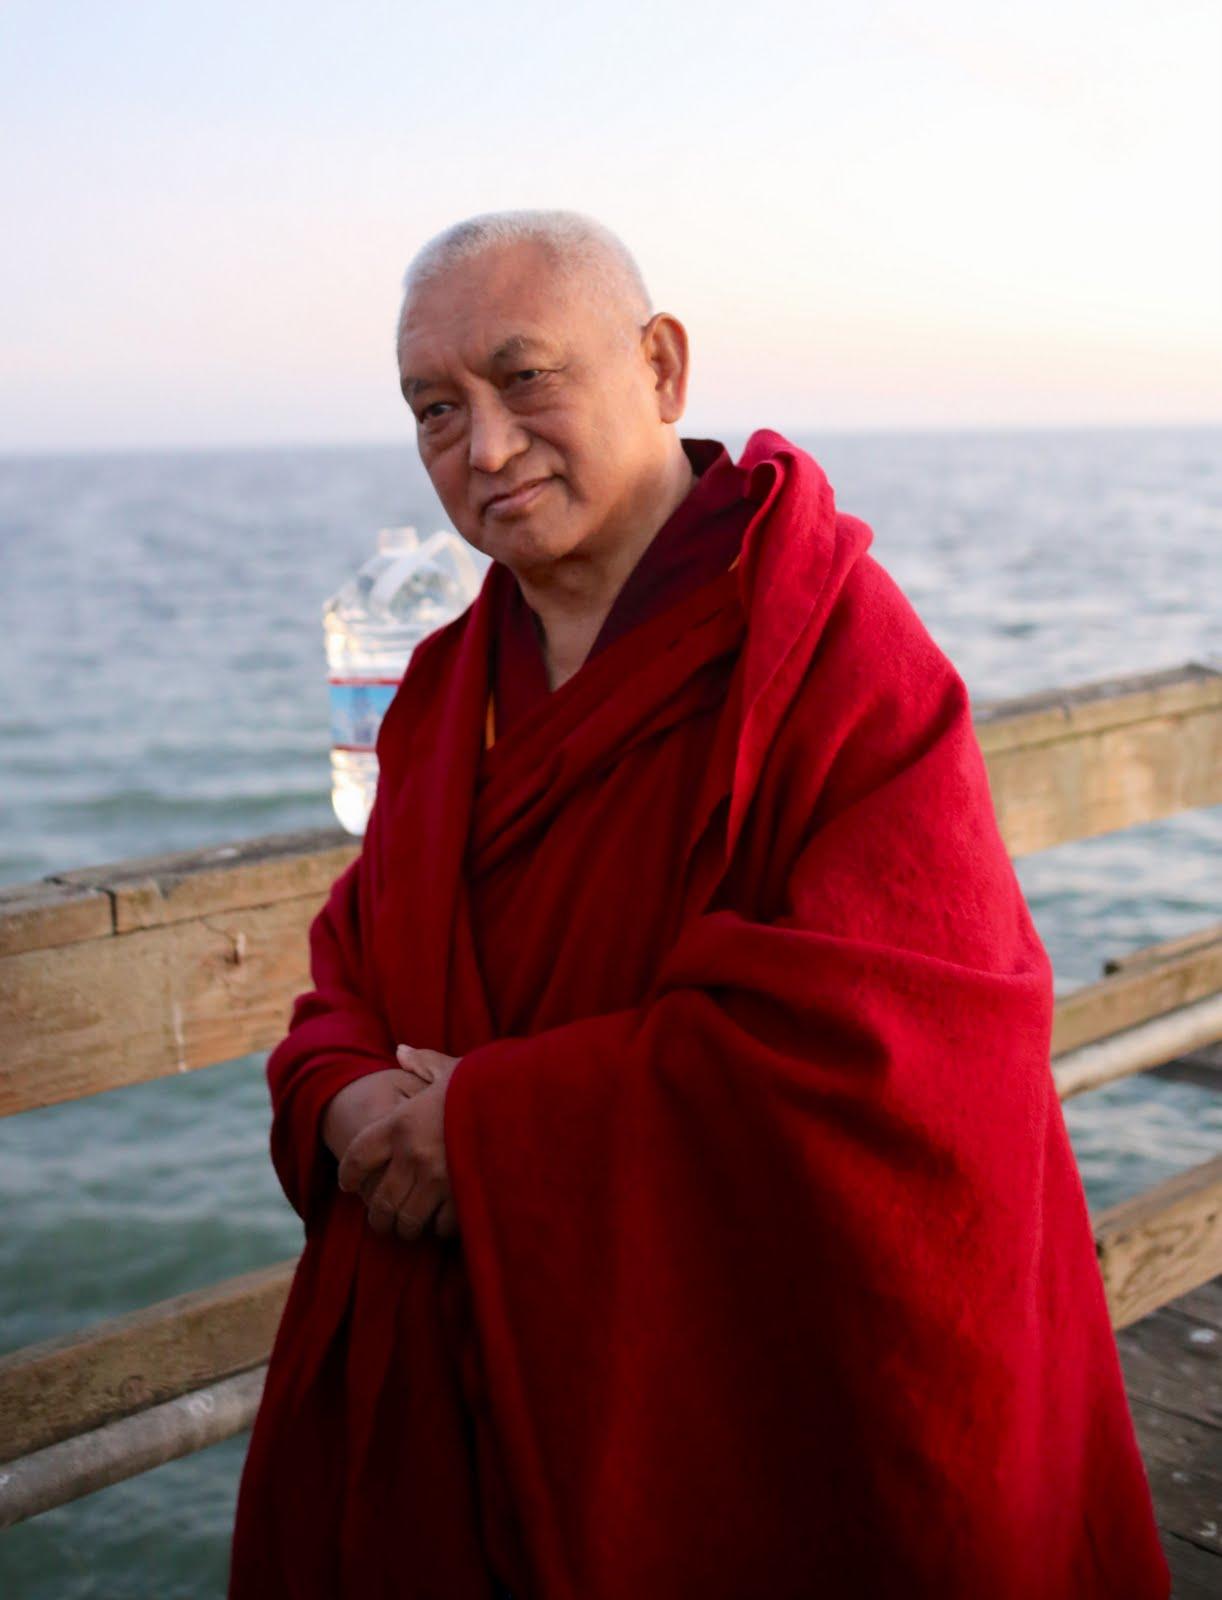 Lama Zopa Rinpoche, California, November 2013. Photo by Ven. Thubten Kunsang.